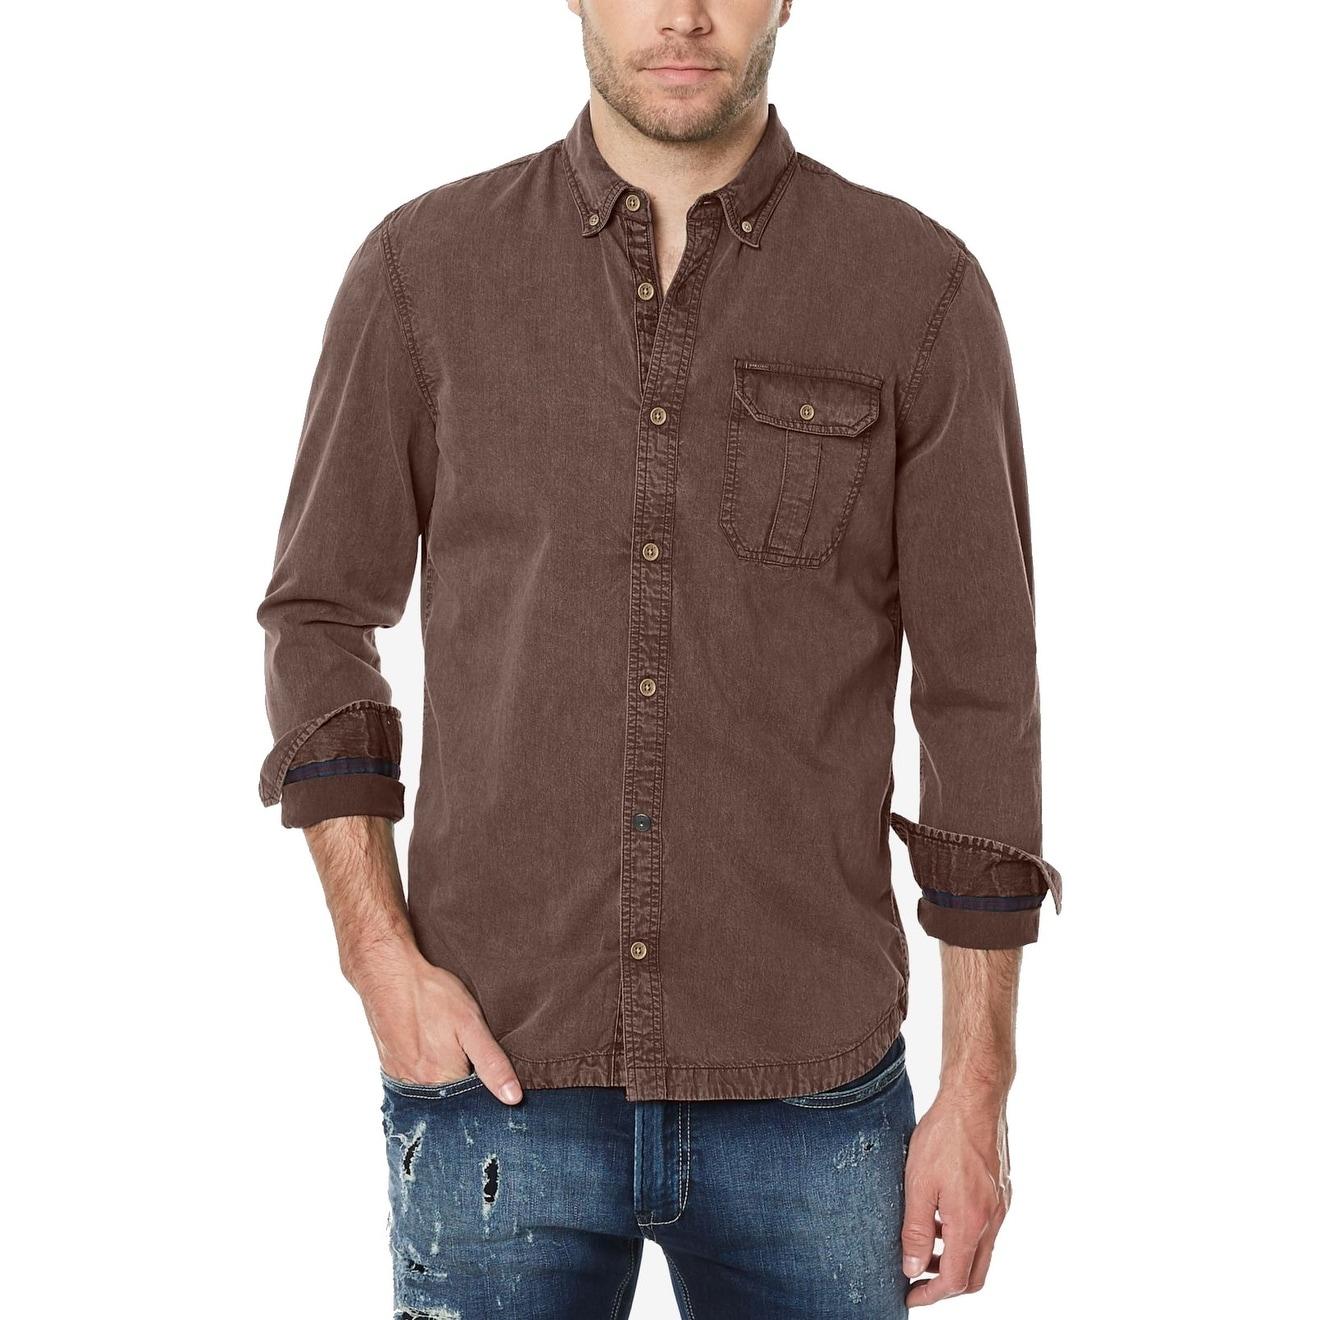 893d3dcb7b Buffalo David Bitton Shirts